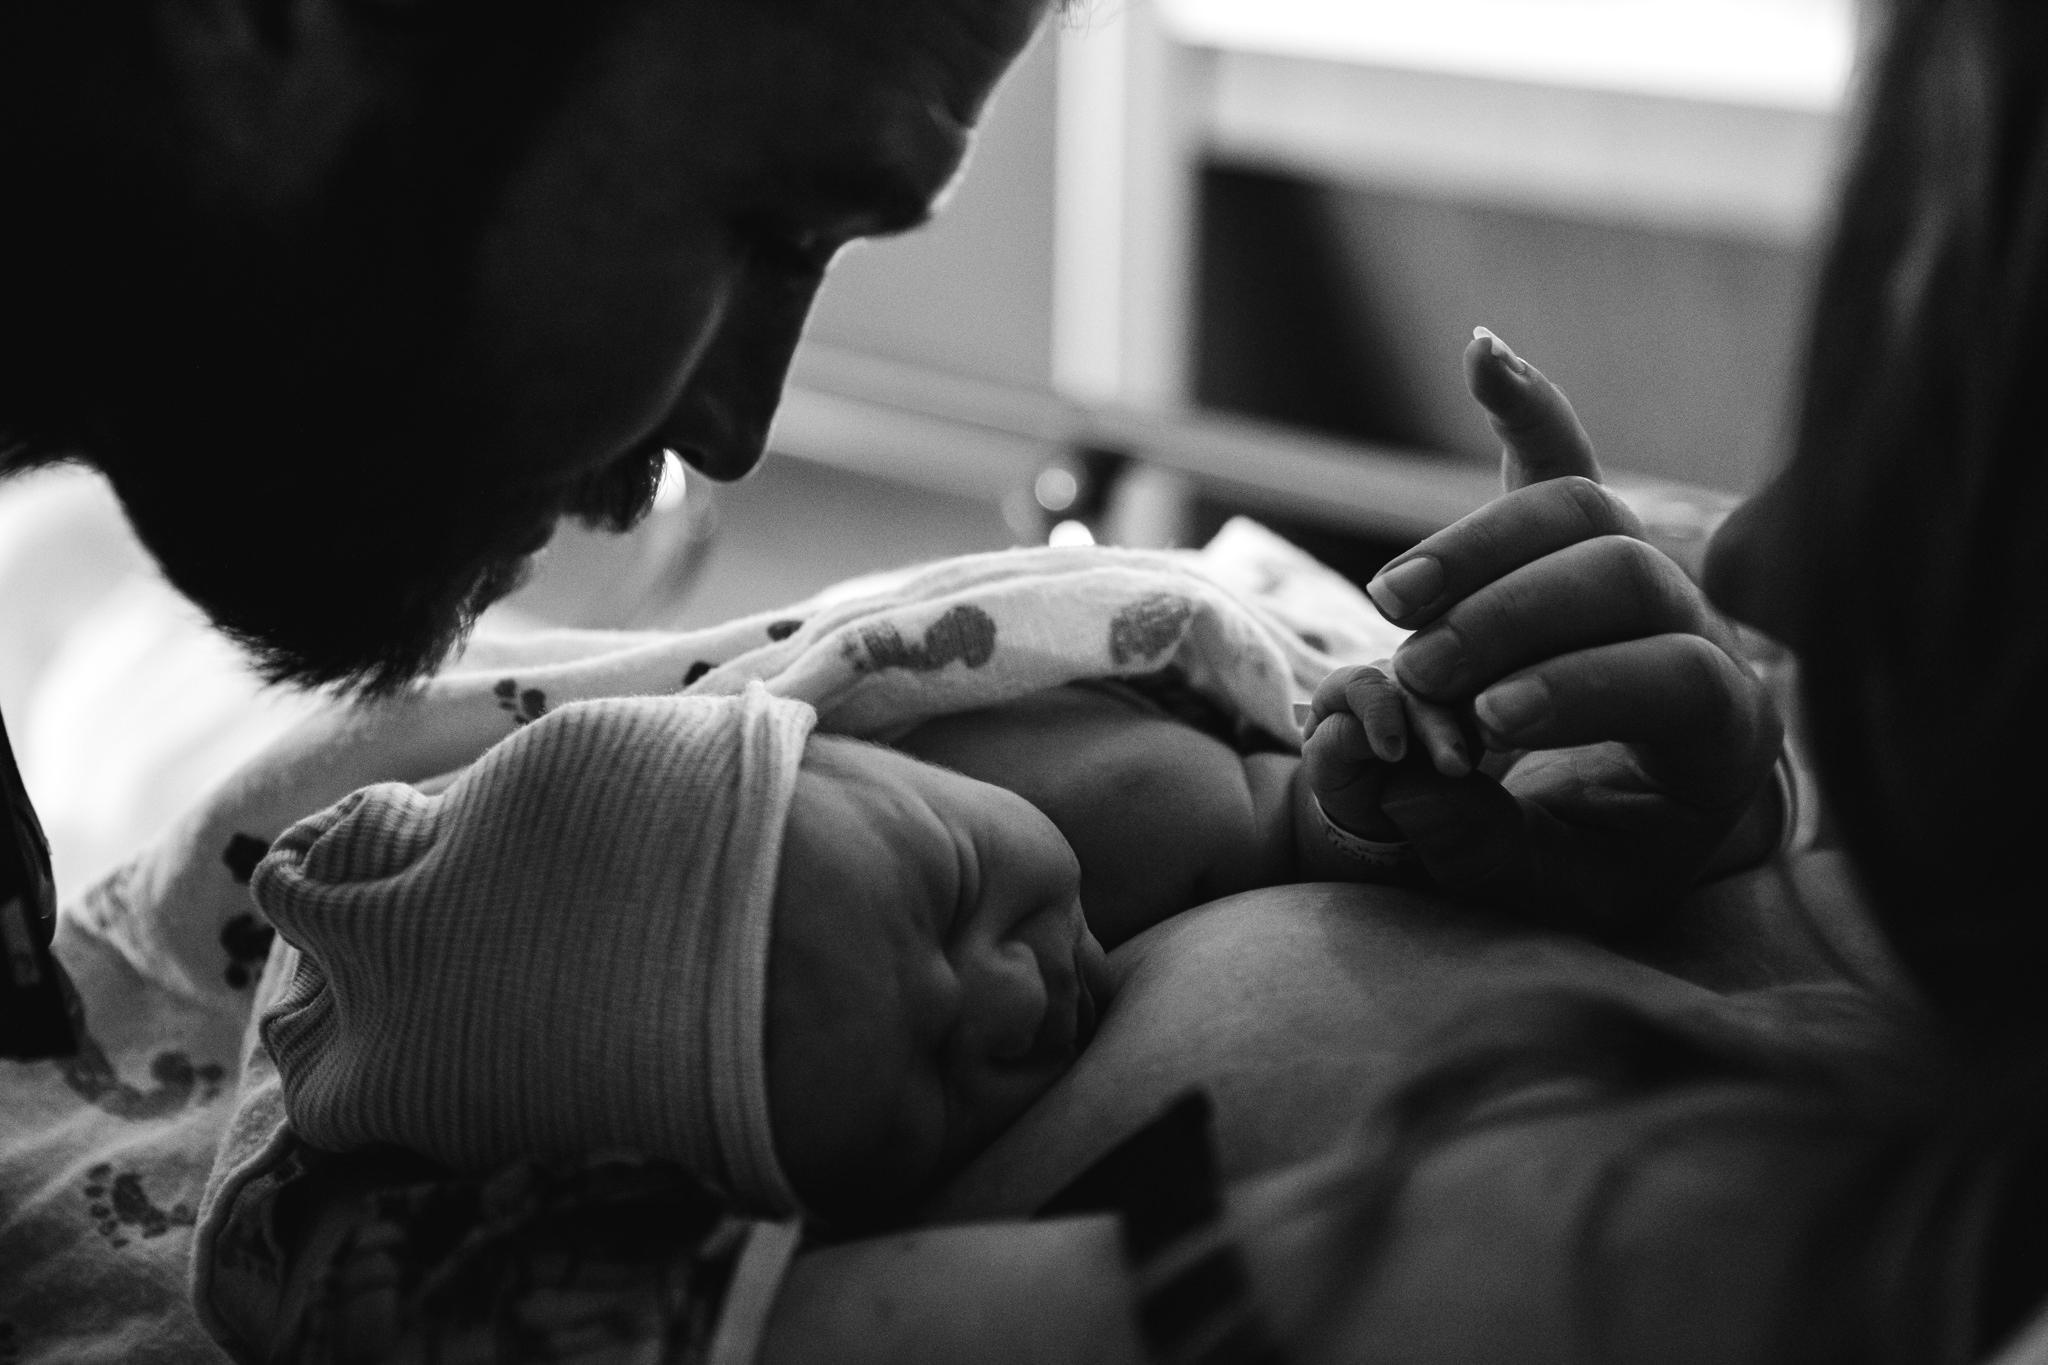 birth-photography-documentary-family-photographer-116.jpg